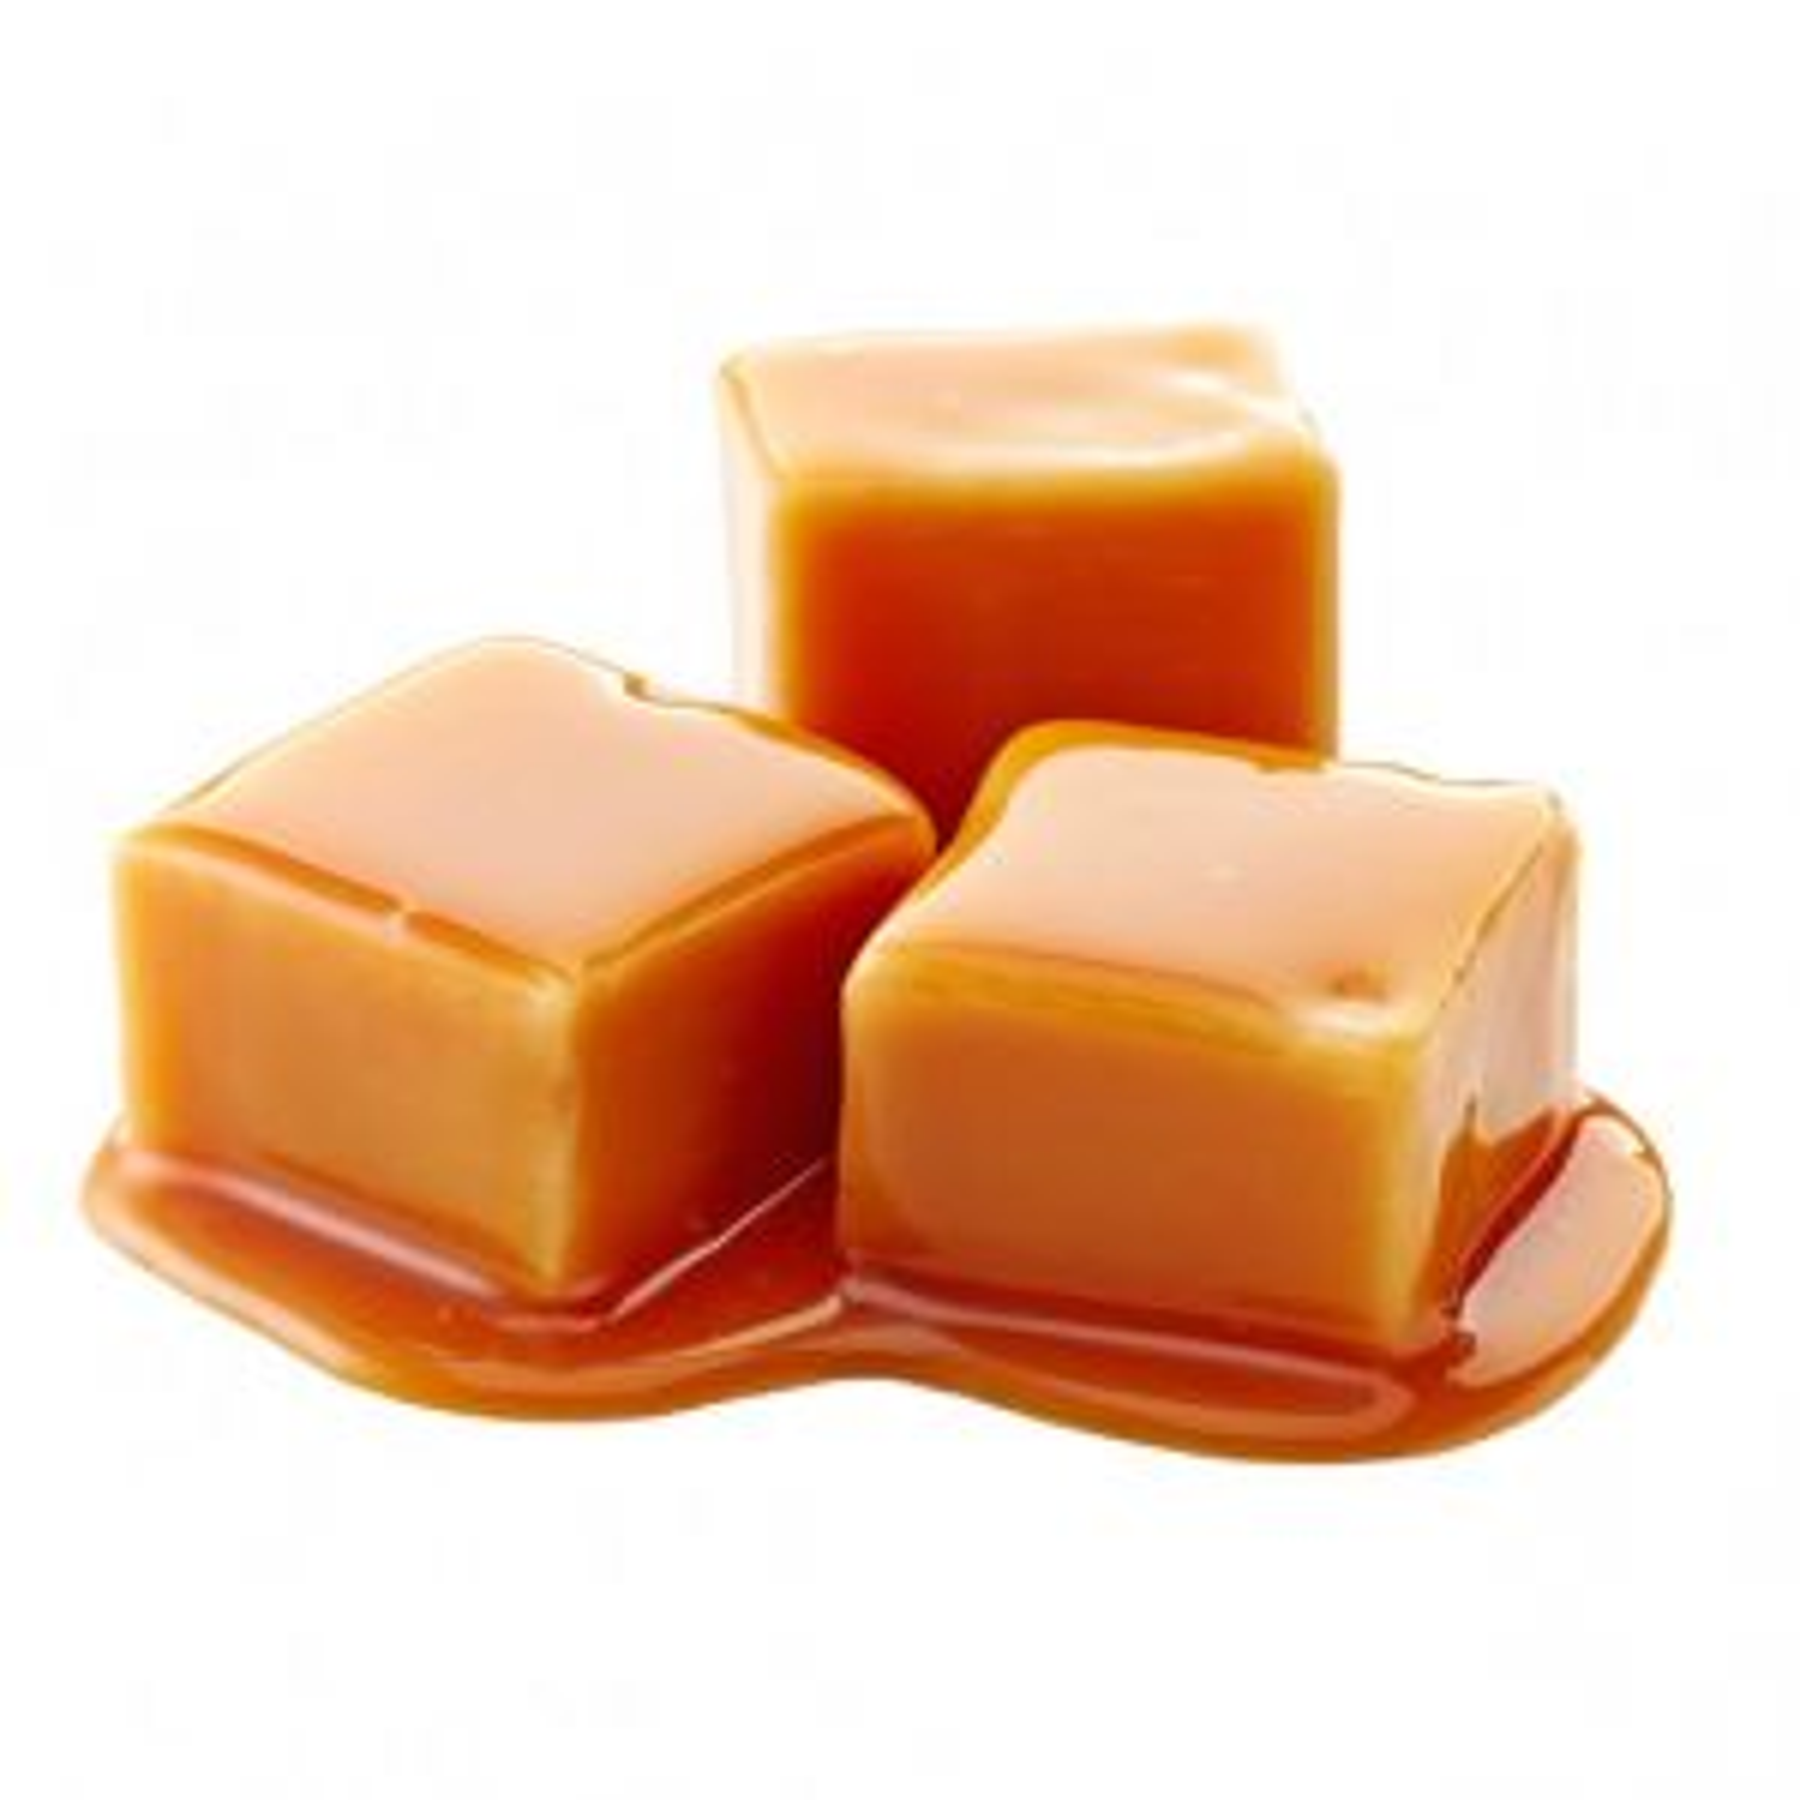 Skoddejuice Caramel Aroma